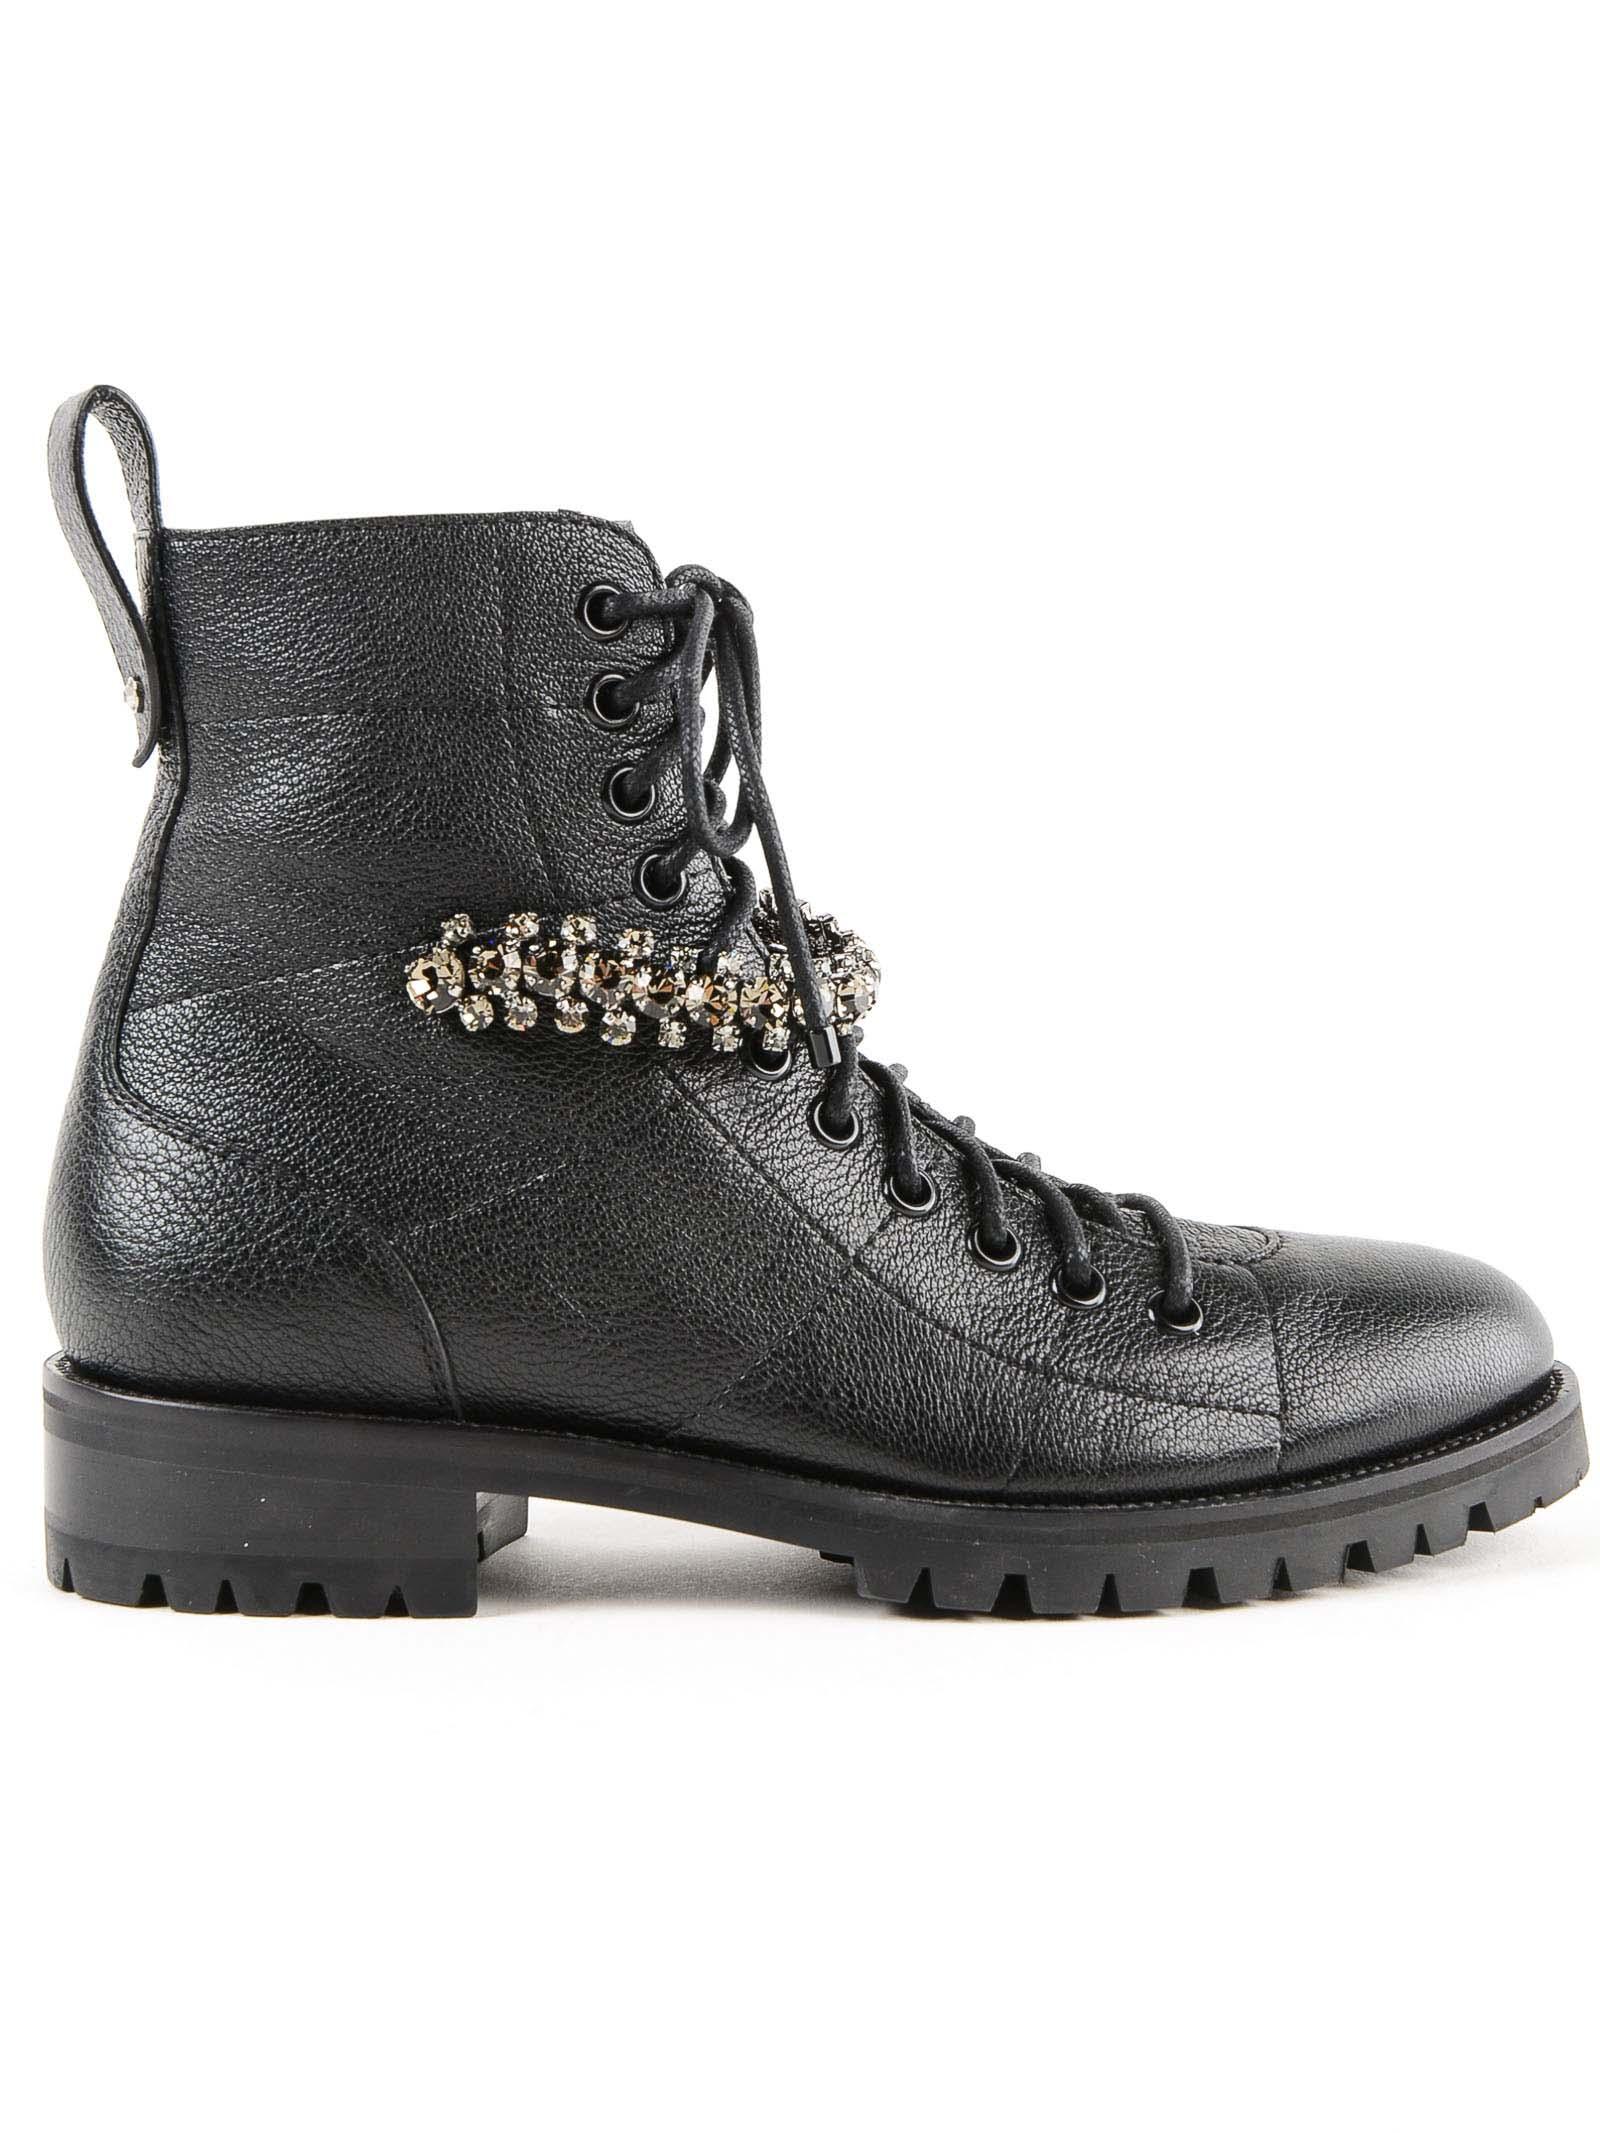 Jimmy Choo Crystal Combat Boots